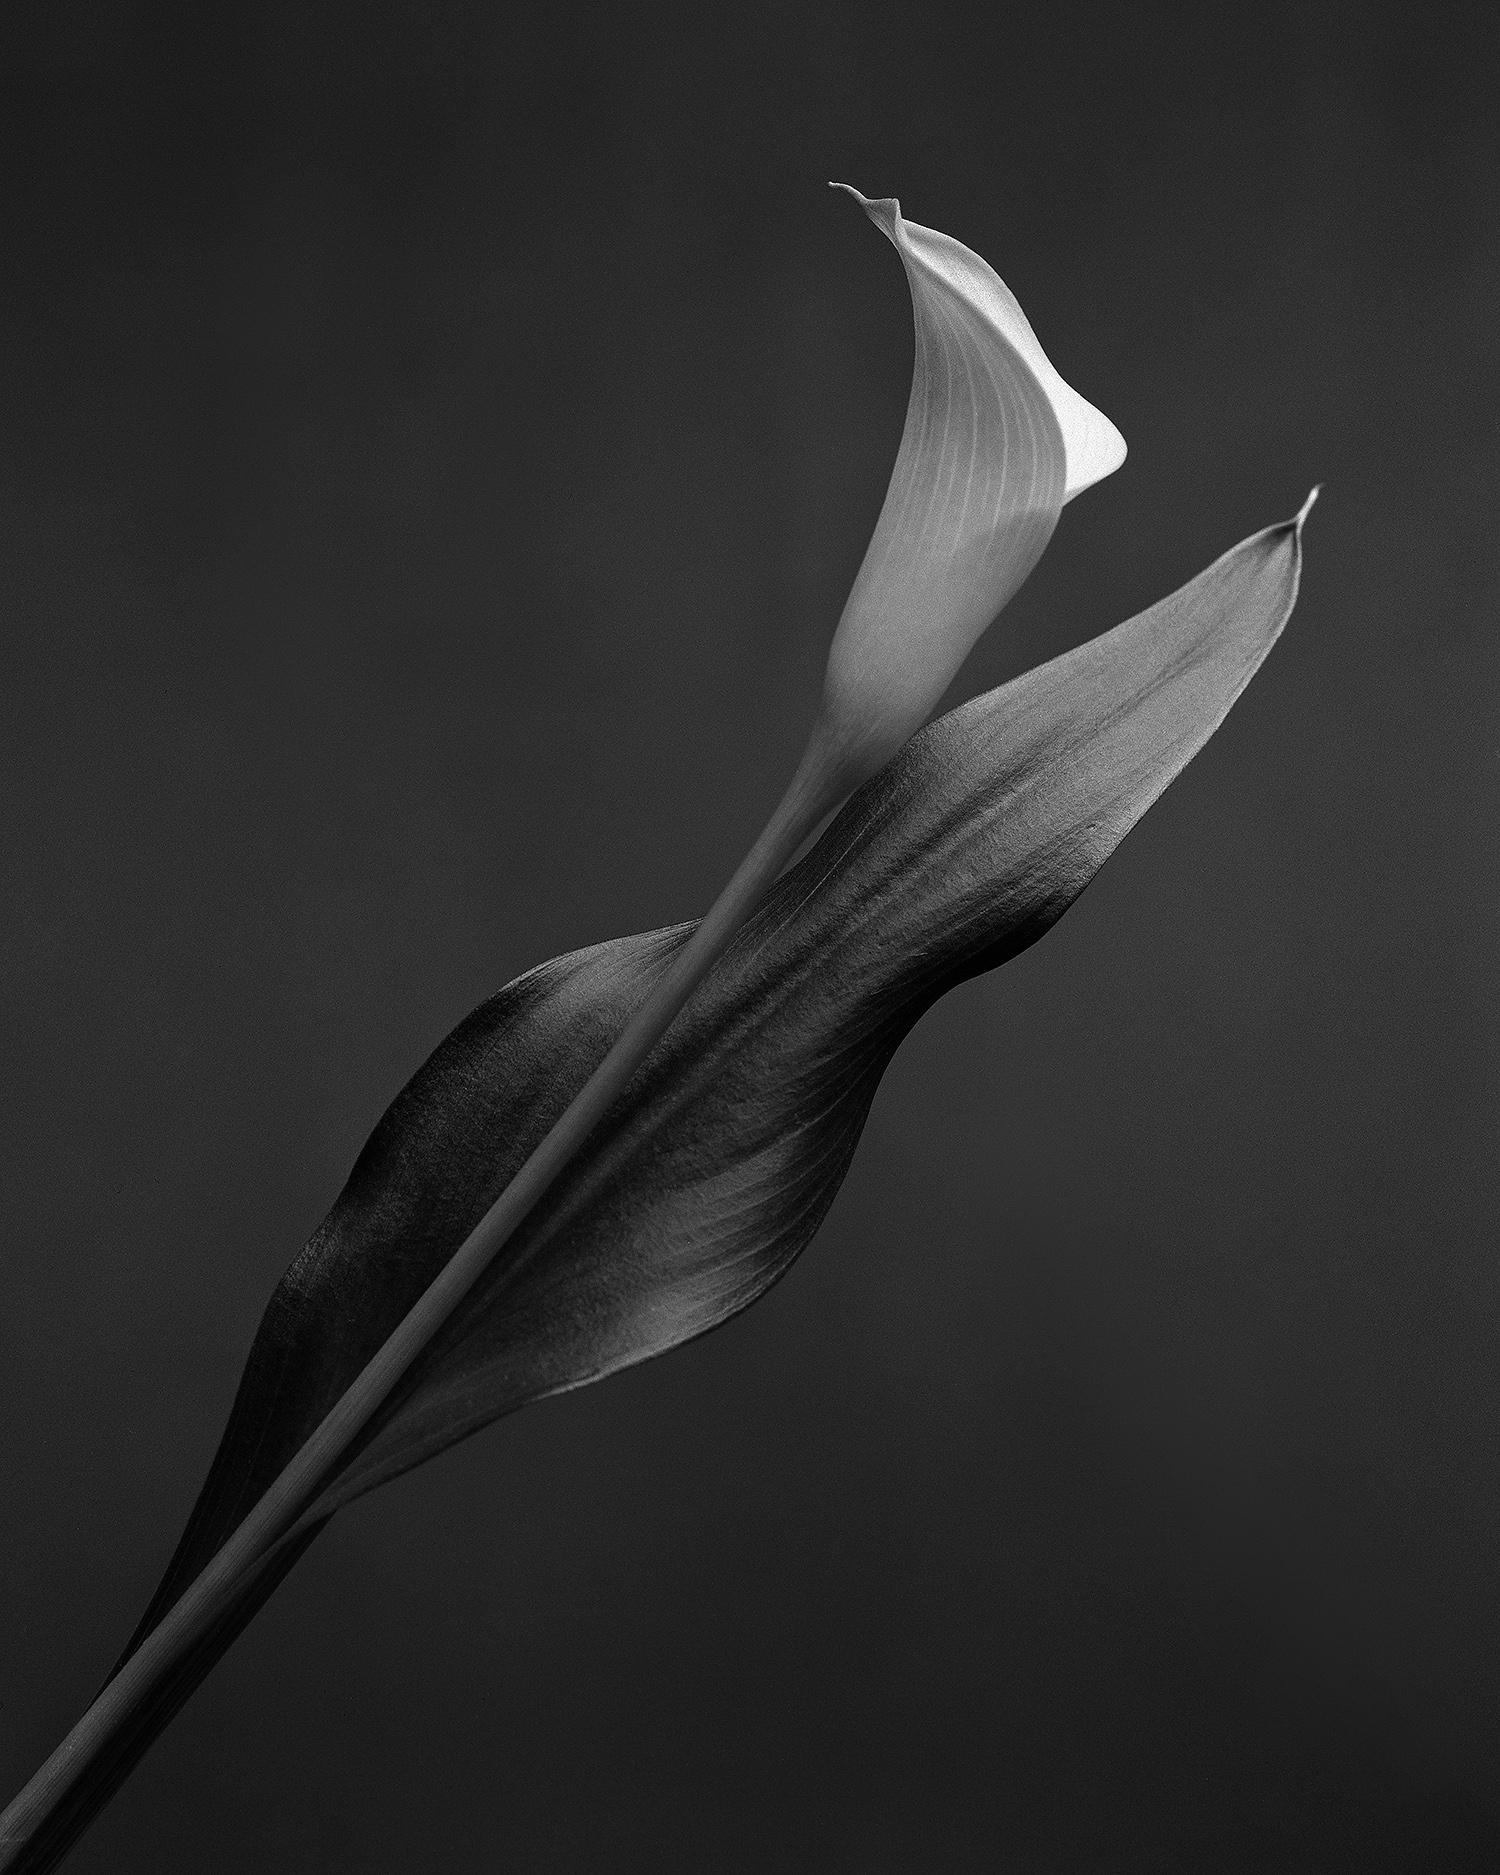 Calla | Crown Graphic 45 | HP5 | Howard Sandler